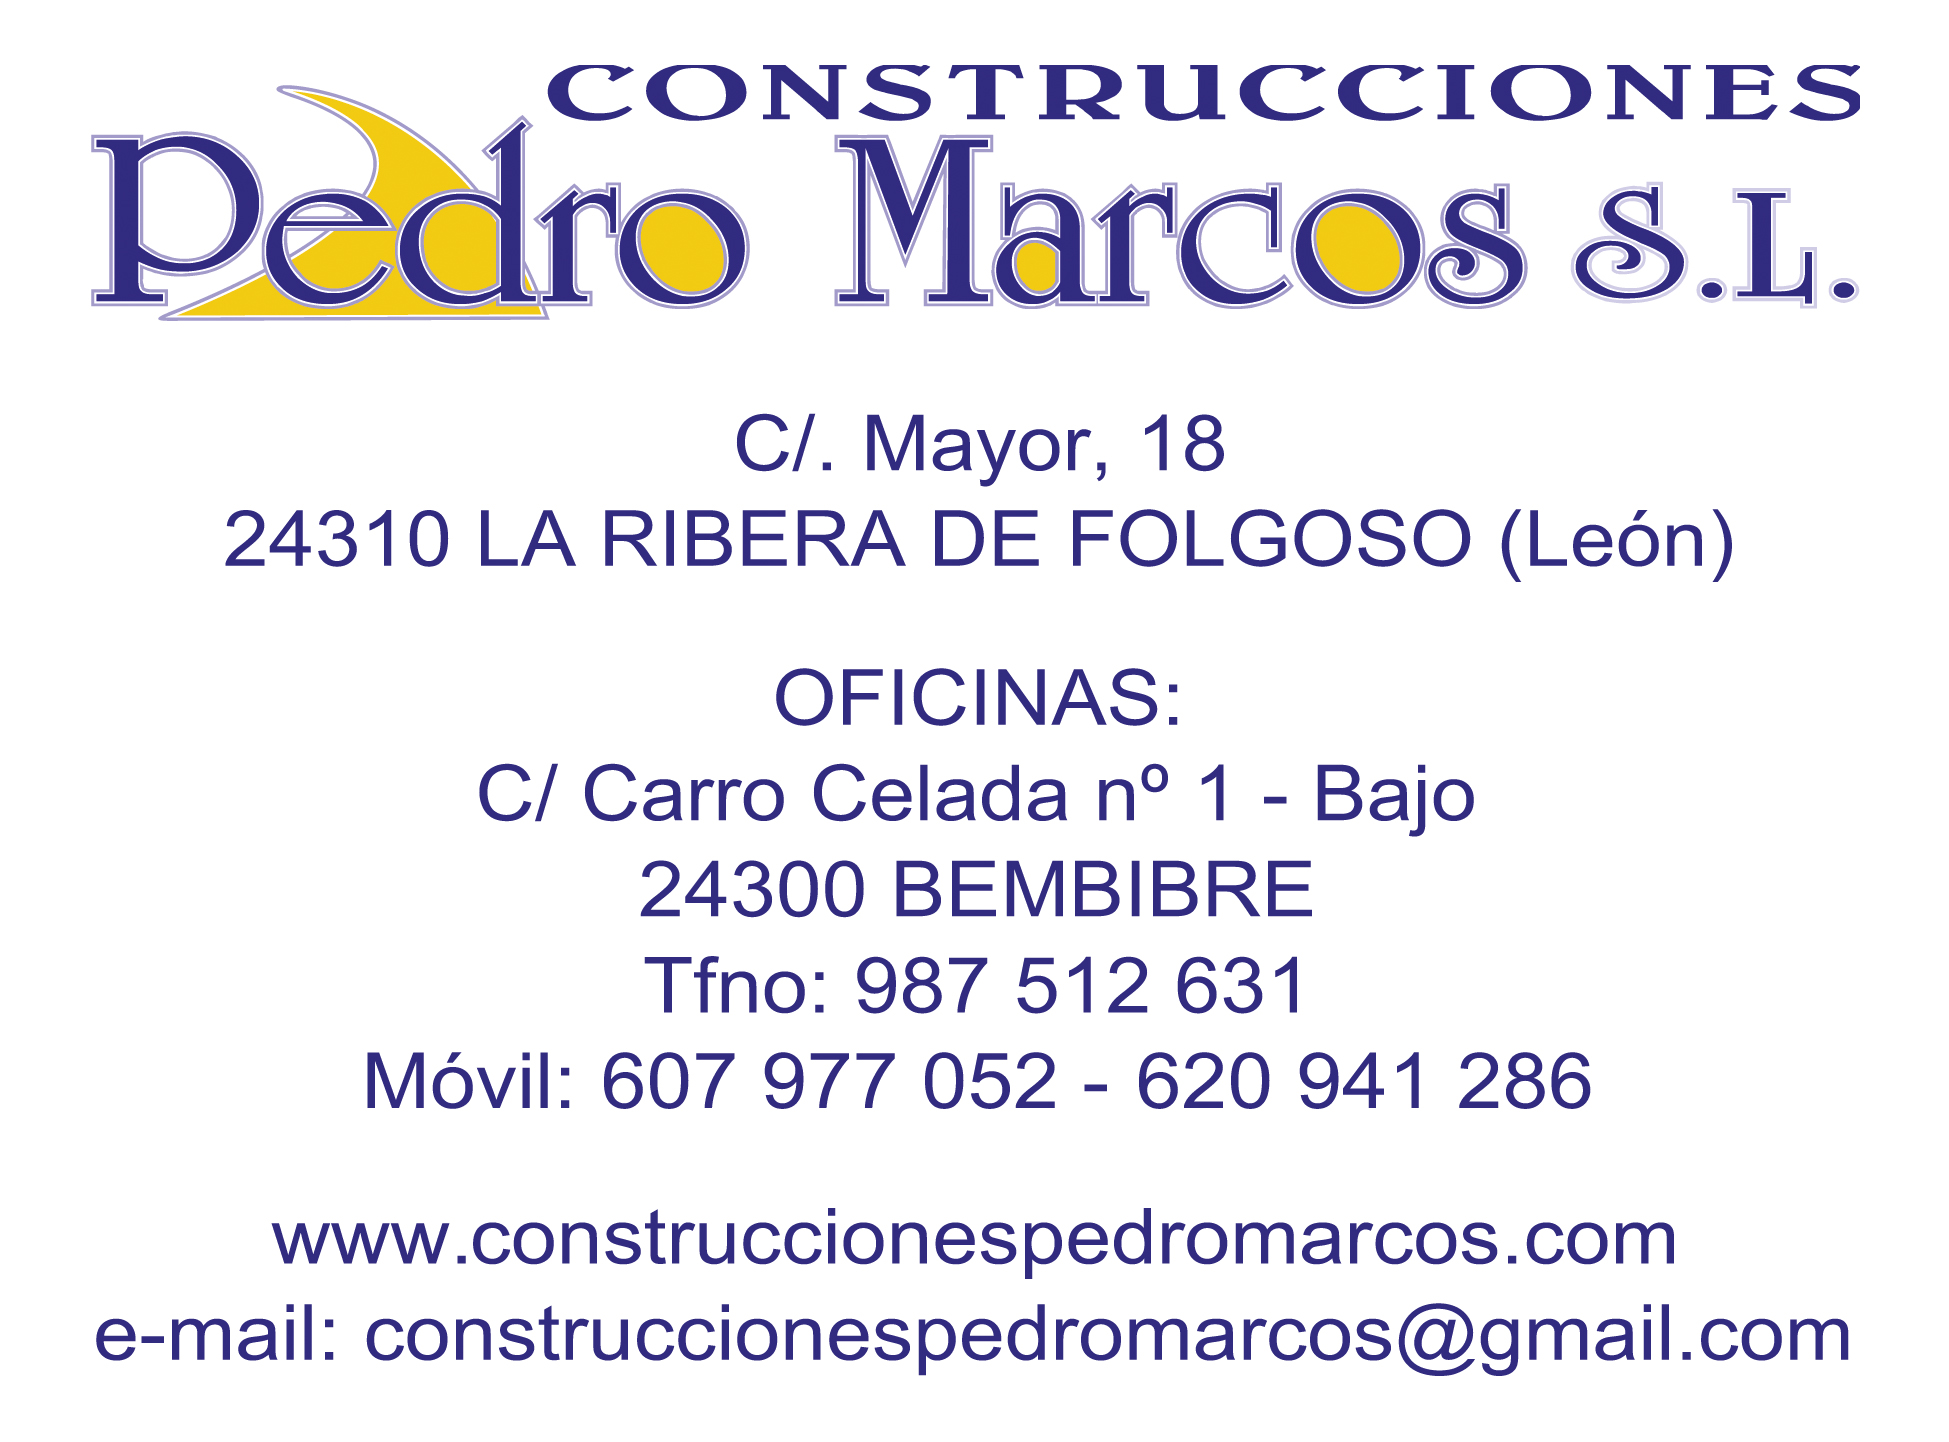 Pedro Marcos